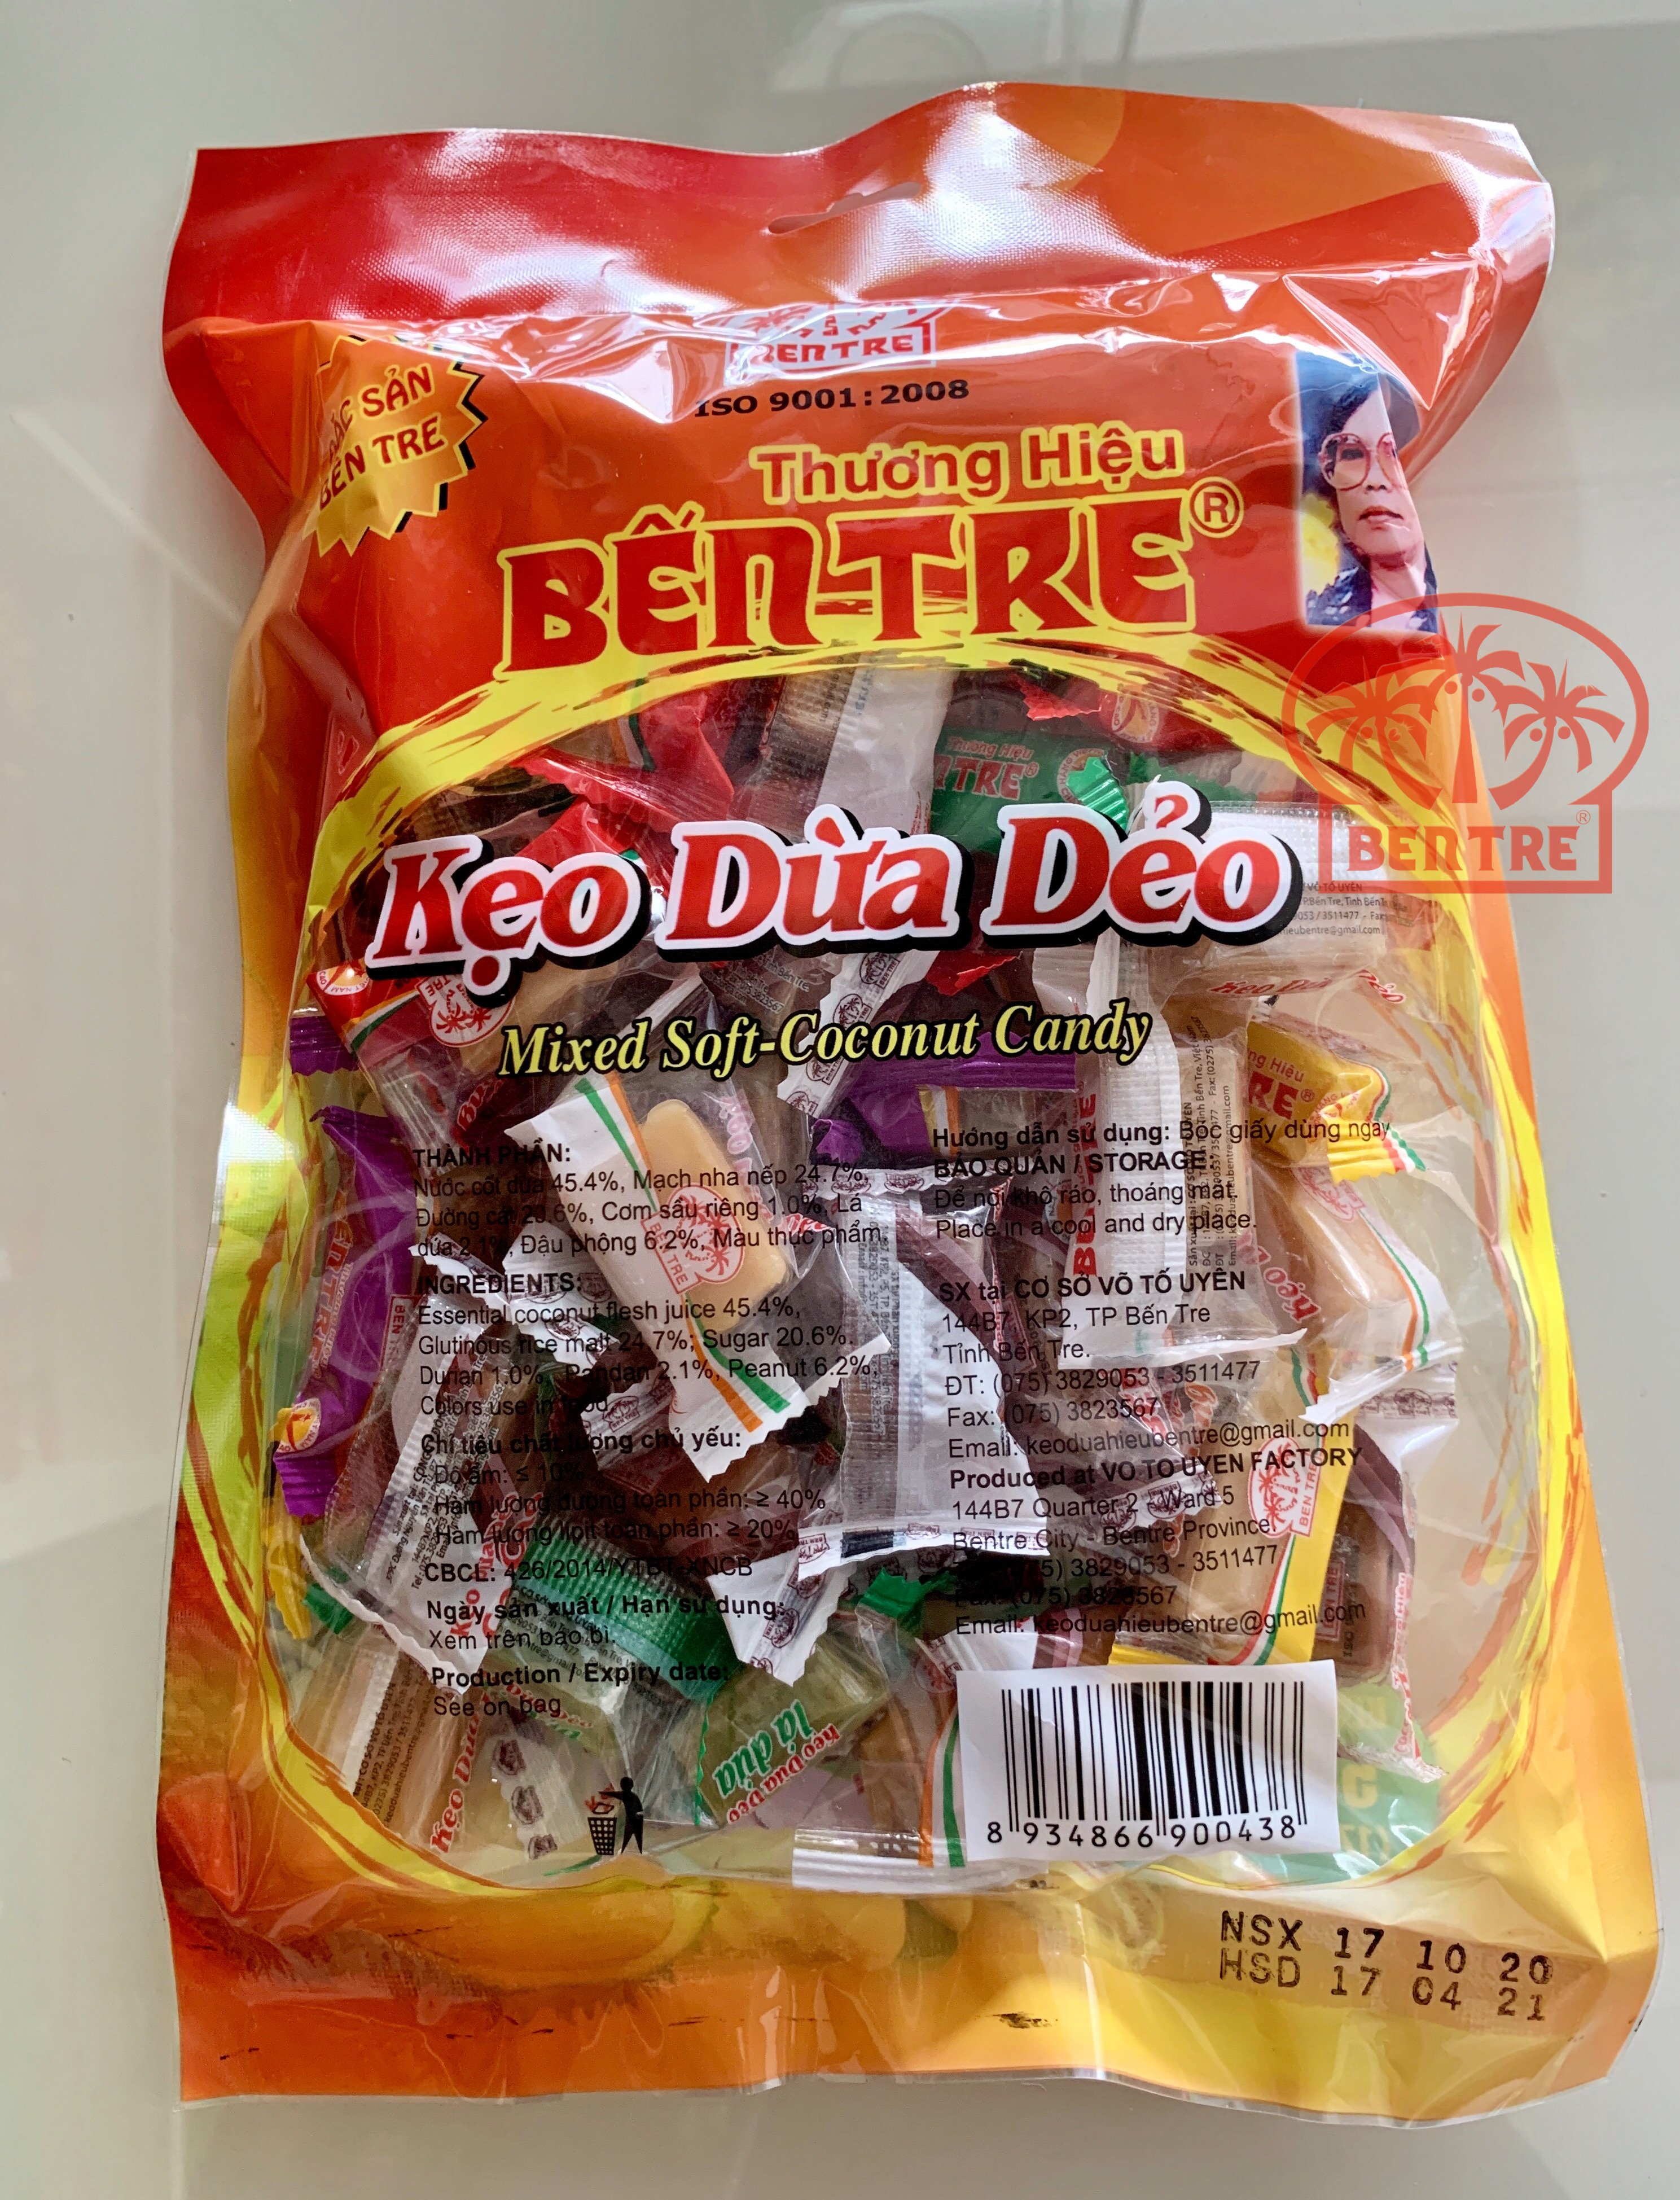 Combo 4 Túi Kẹo Dừa Dẻo hiệu Bà Hai Tỏ Bến Tre - Sáu Vị 2kg